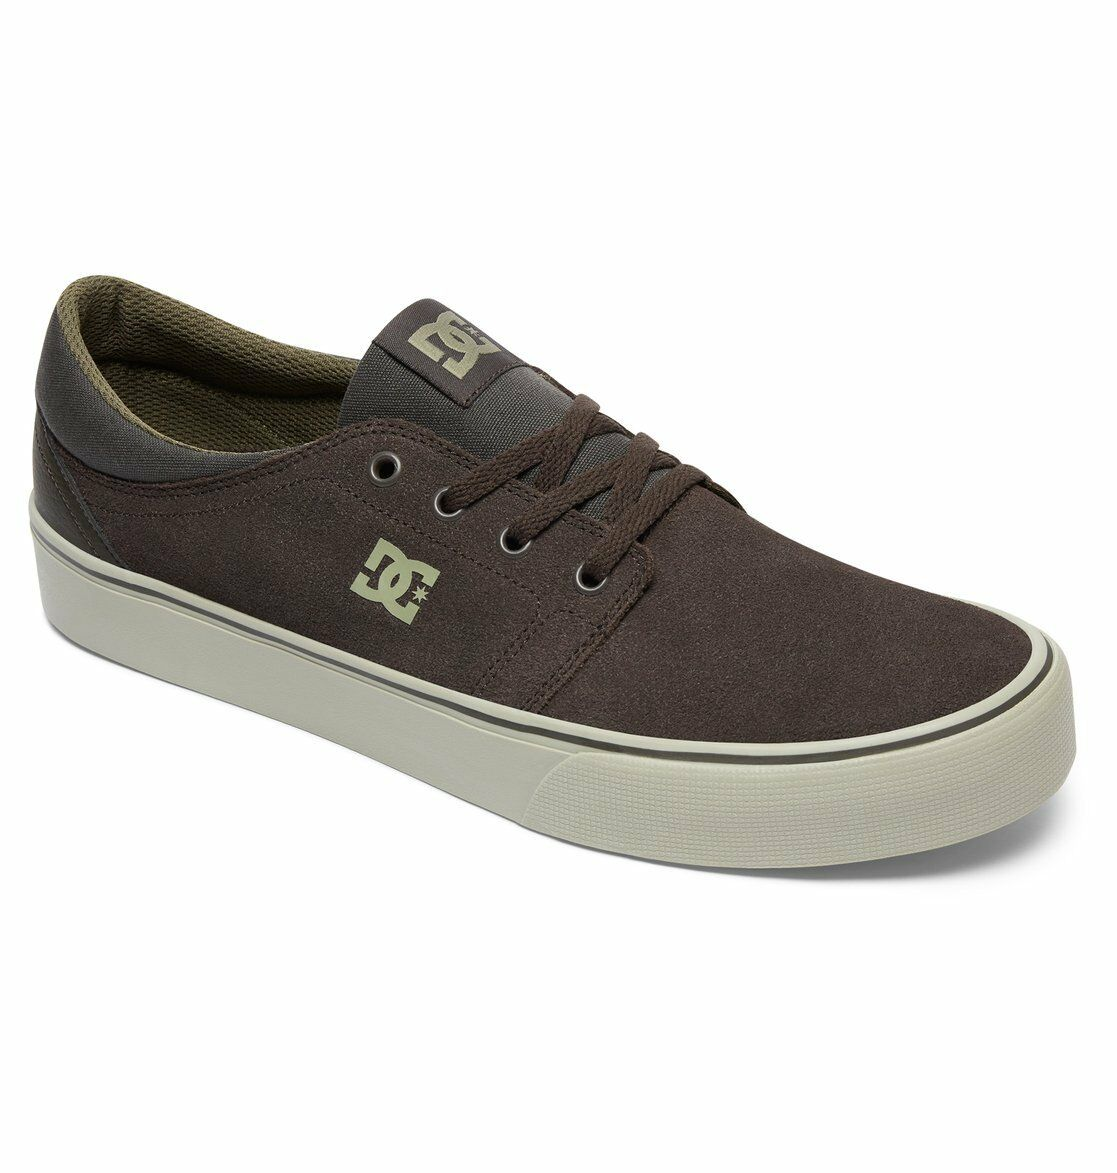 Dc Shoes Trase Sd Veloursleder Militärgrün - Creme BDYS300172 MC3 Herren